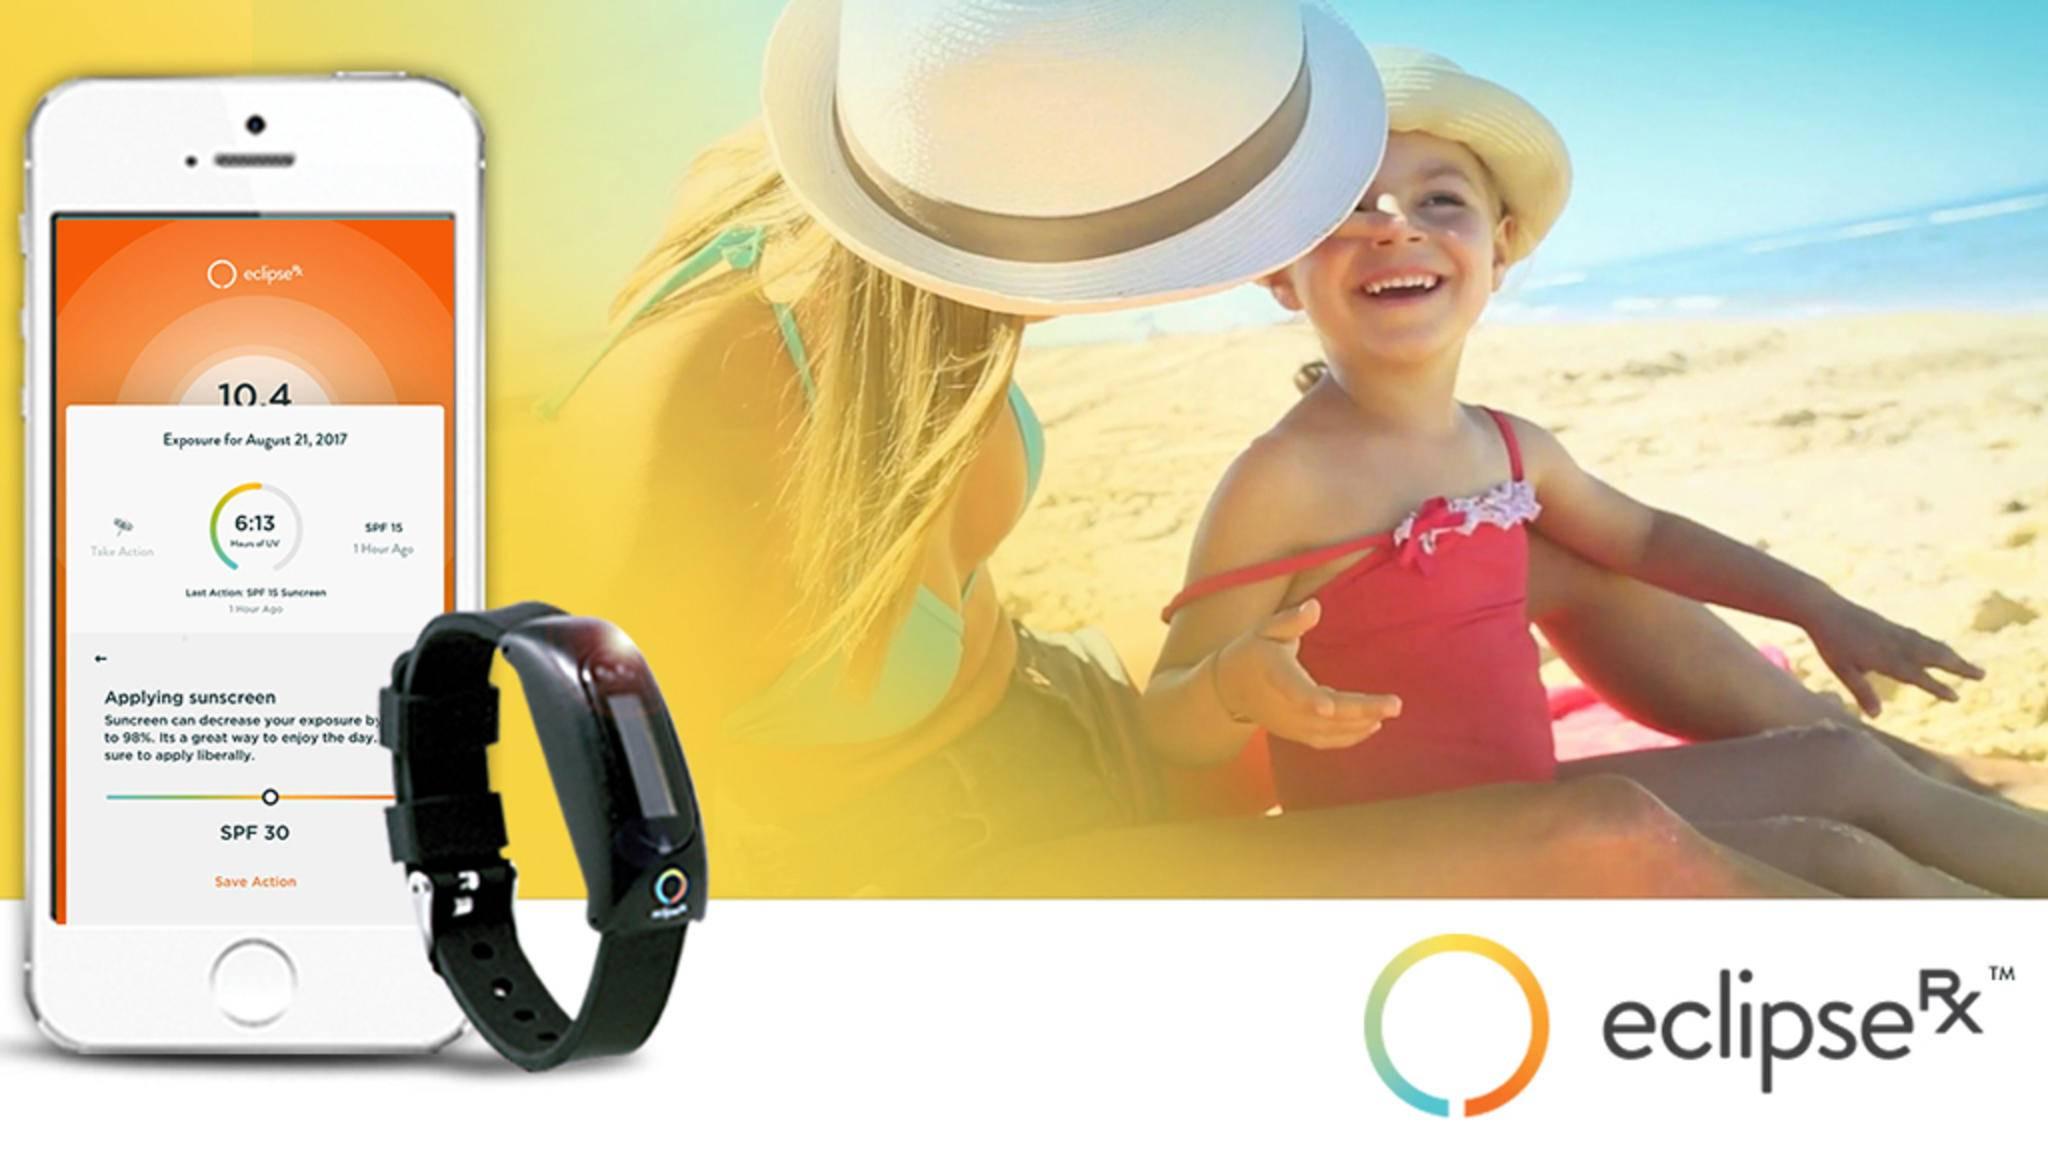 Das Wearable Eclipse RX unterstützt den User bei der Sonnenbrand-Prophylaxe.